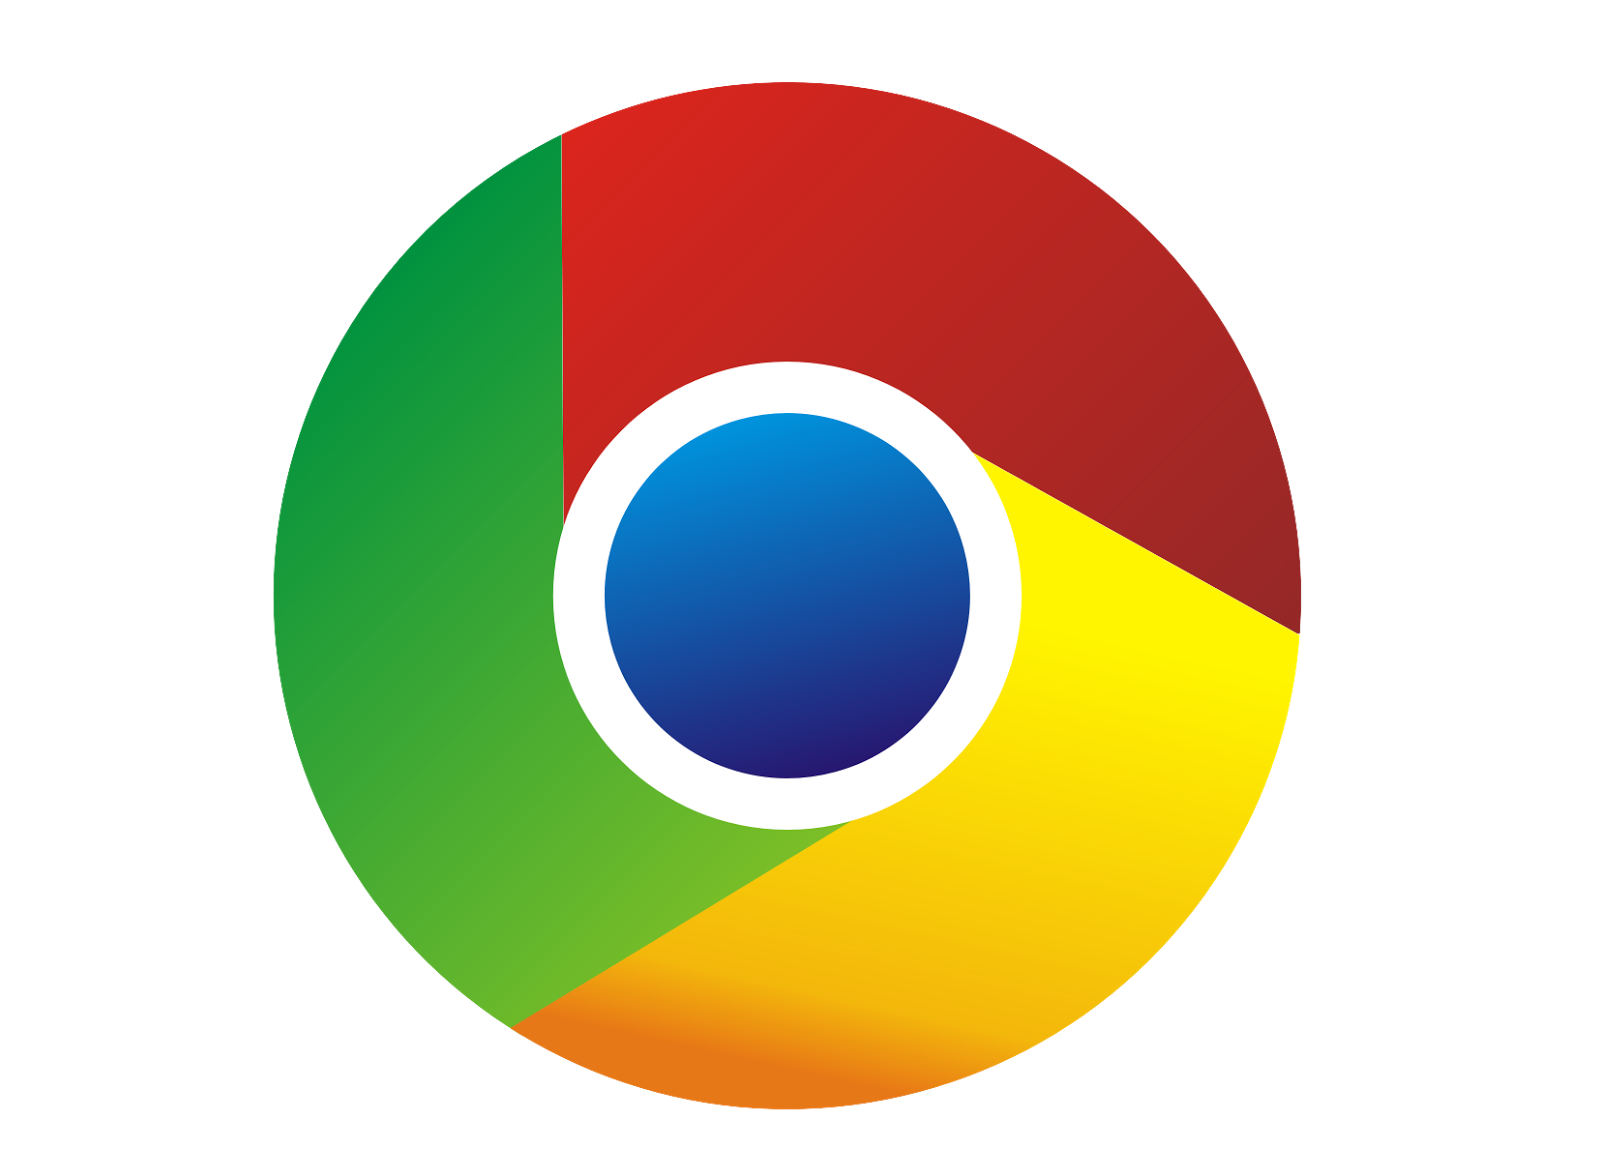 google chrome logo vector png transparent google chrome logo vector